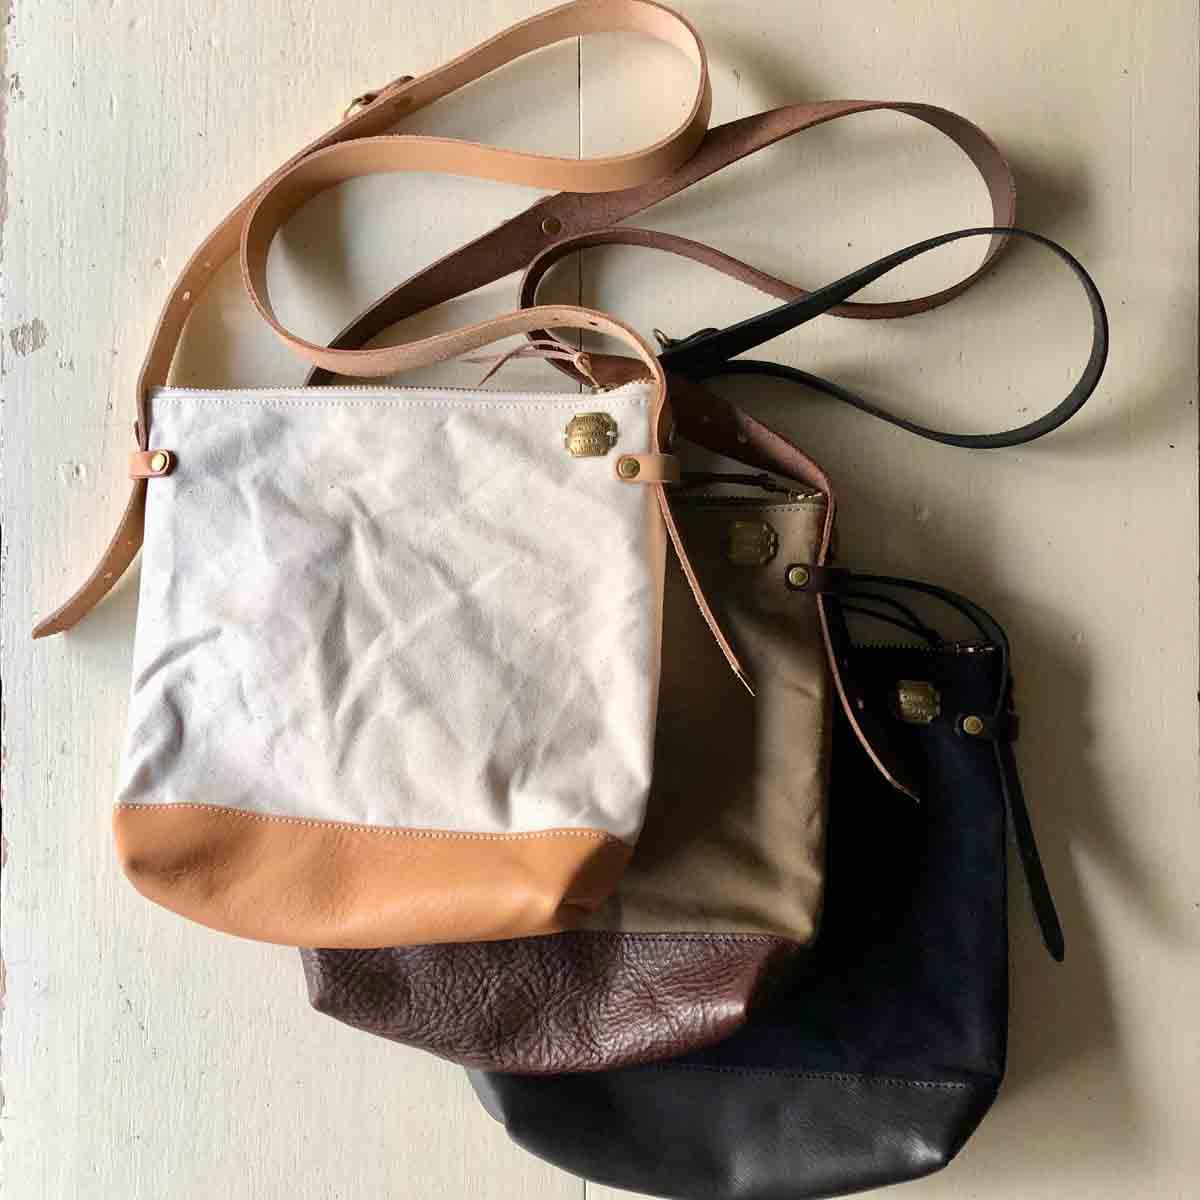 The Superior Labor シュペリオールレイバー leather bottom shoulder bag deep S レザーボトムショルダーバッグディープS 3 colors